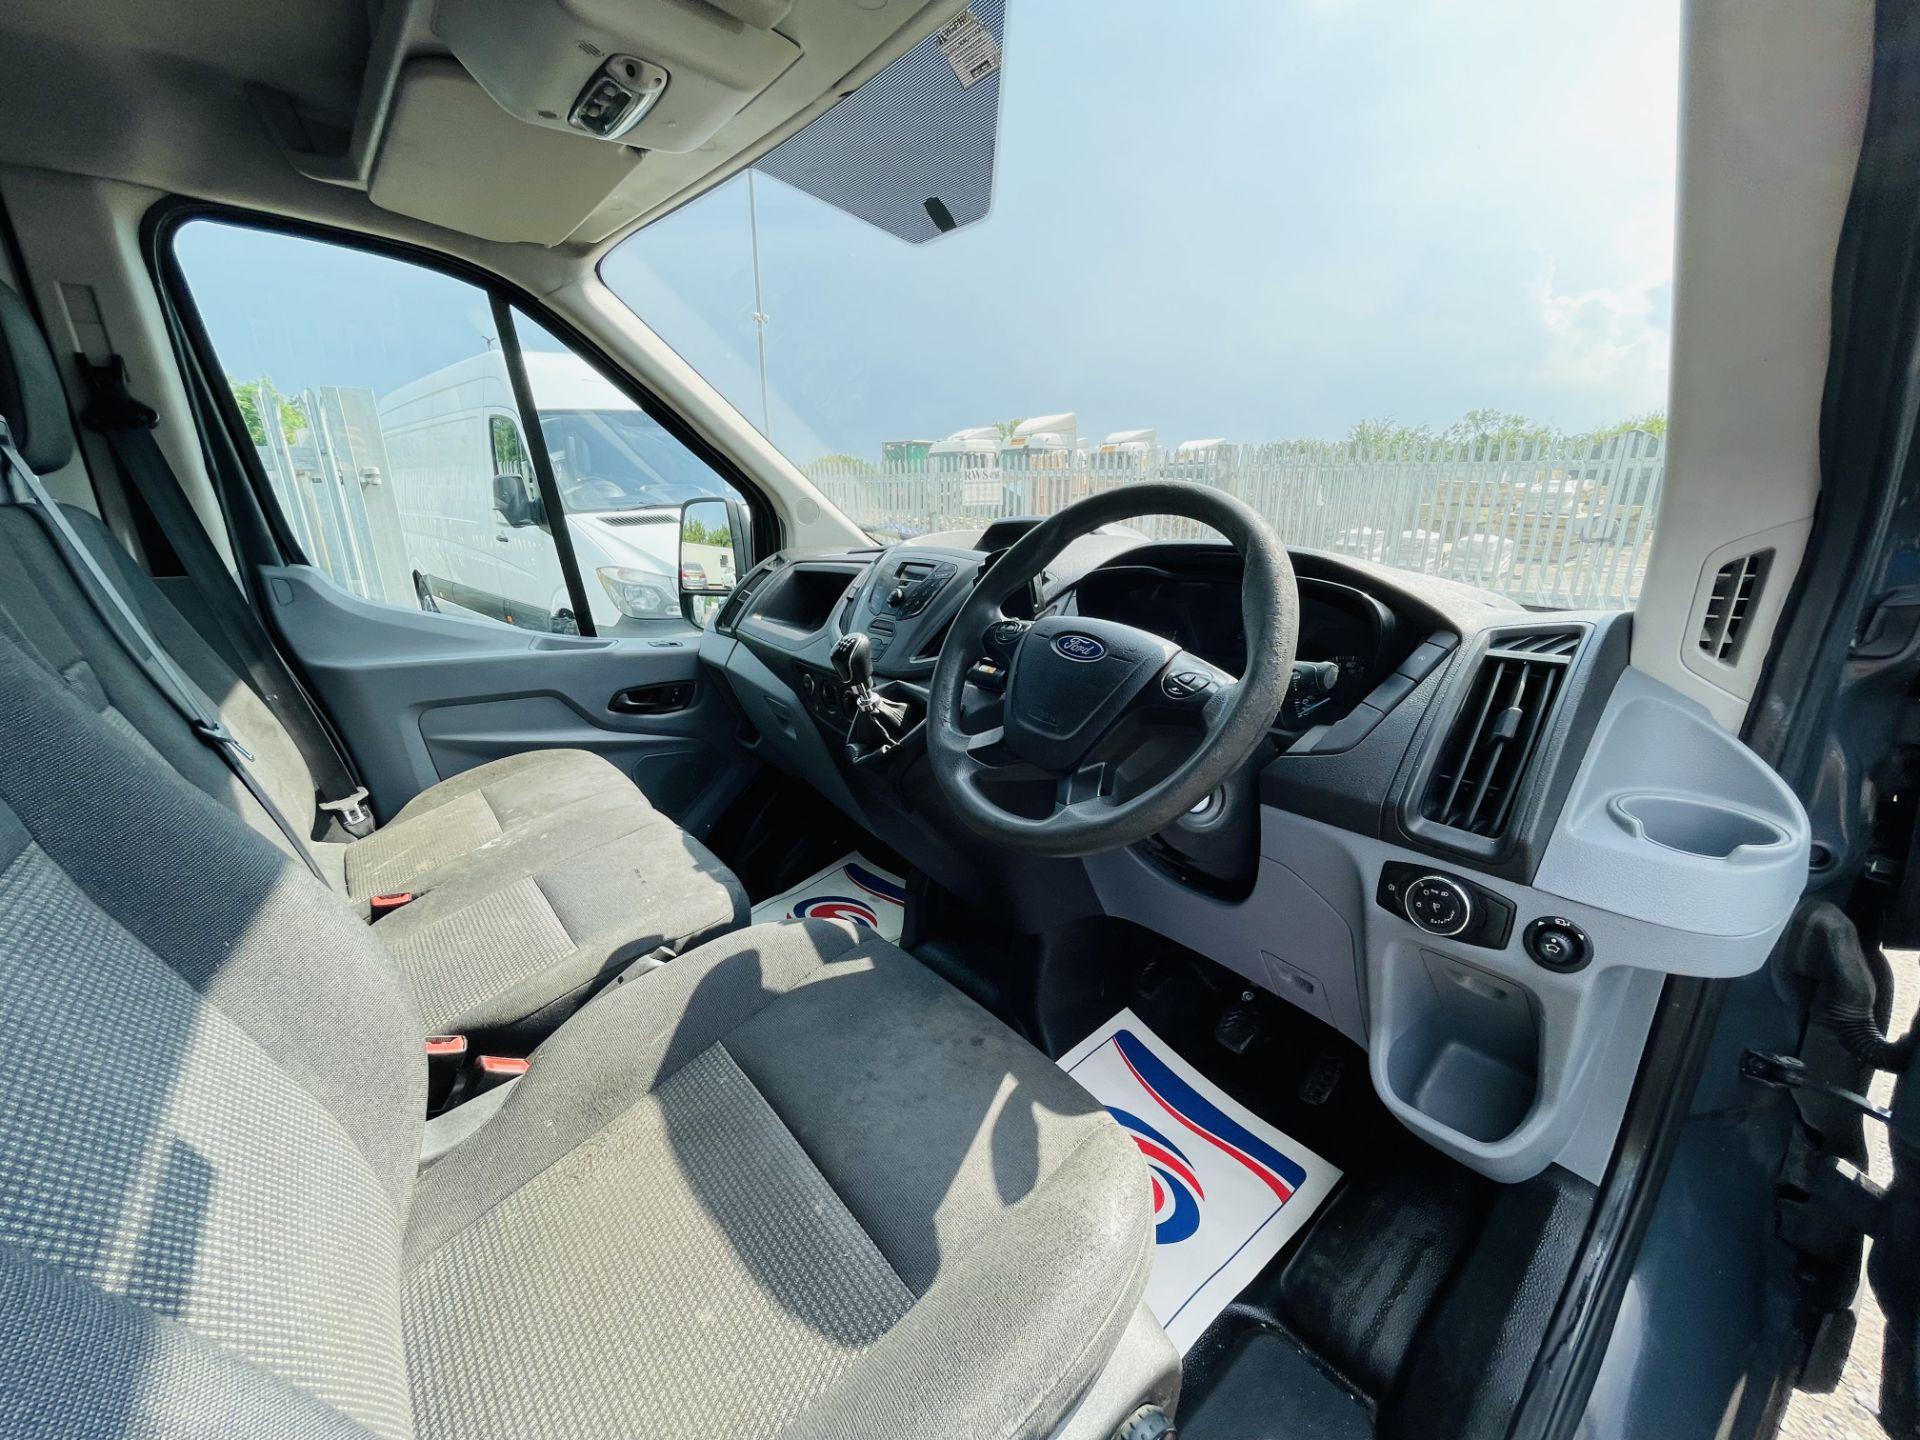 Ford Transit 2.2 TDCI 100 L3 H2 T350 2015 '65 Reg' - Panel Van - LCV - Grey - Image 12 of 14